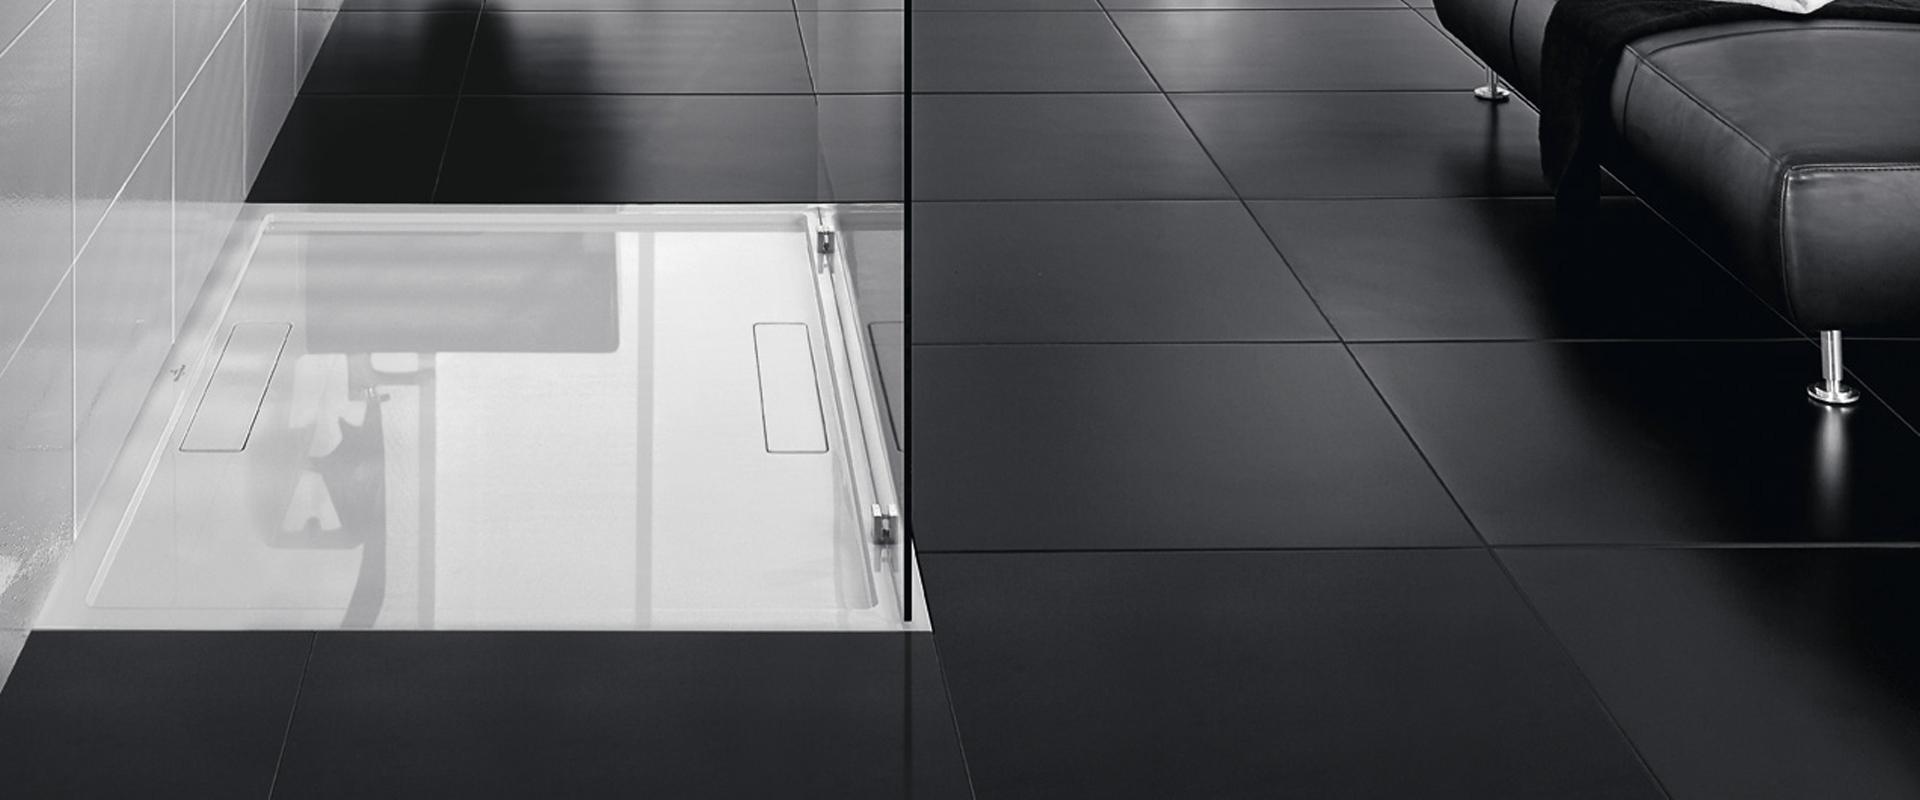 quaryl nature perfected villeroy boch. Black Bedroom Furniture Sets. Home Design Ideas